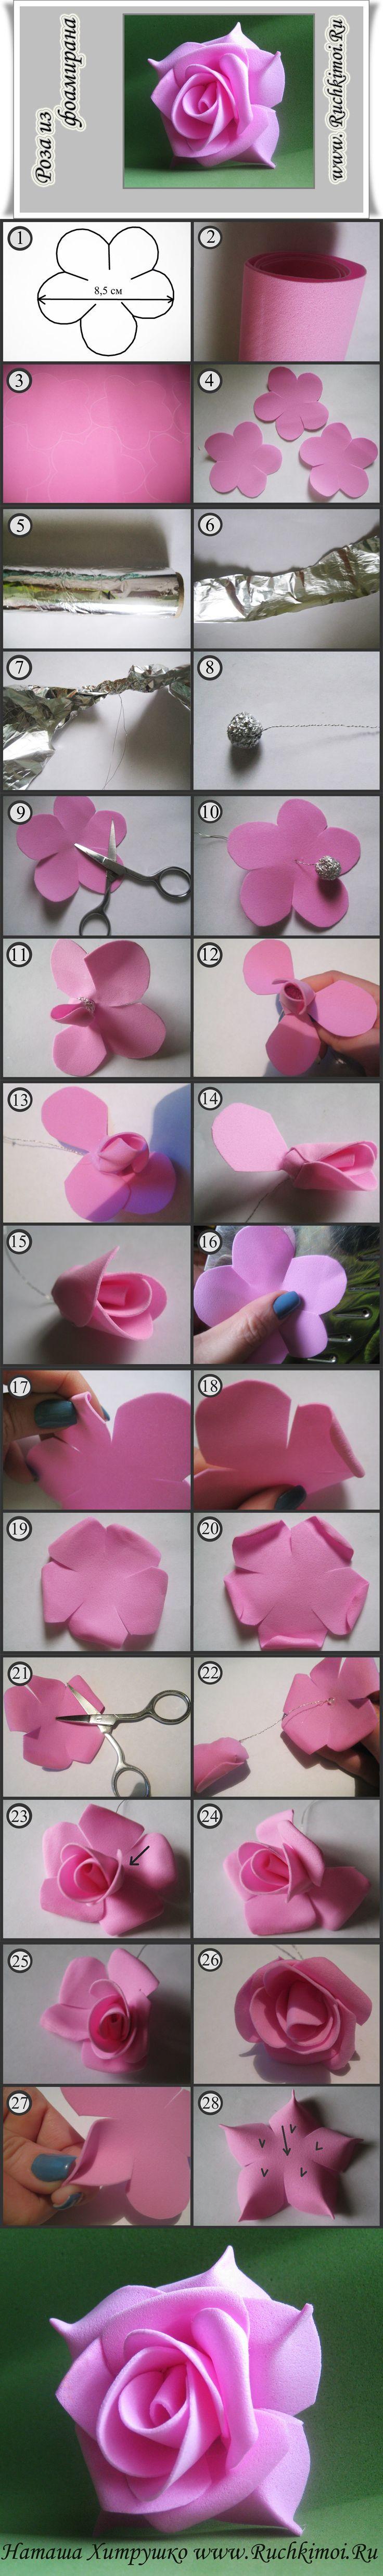 Роза из фоамирана своими руками. Подробный МК здесь http://www.ruchkimoi.ru/roza-iz-foamirana-svoimi-rukami-vtoroy-variant/